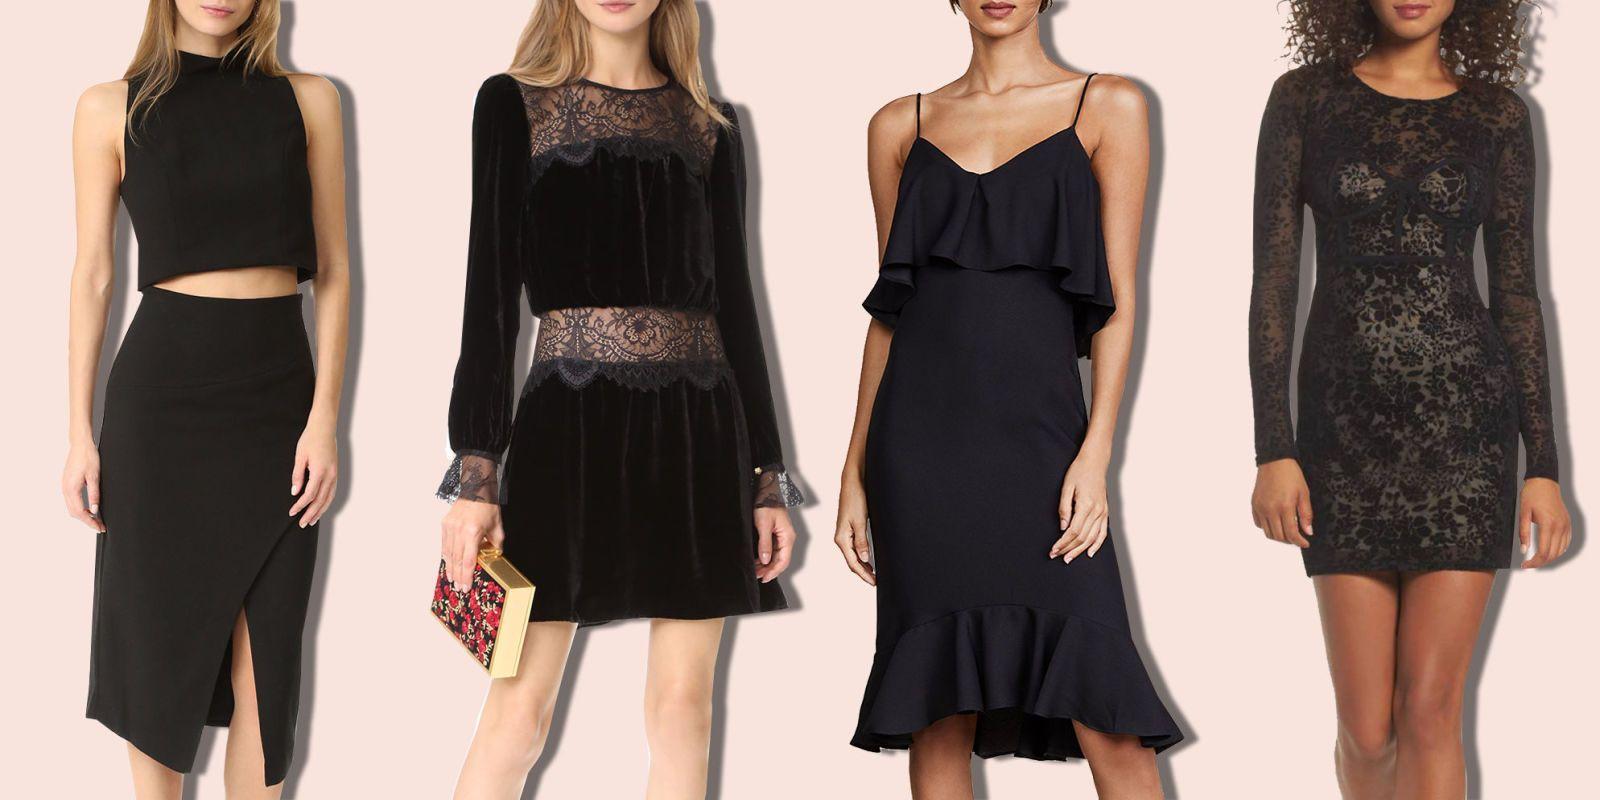 Black Dress 2018